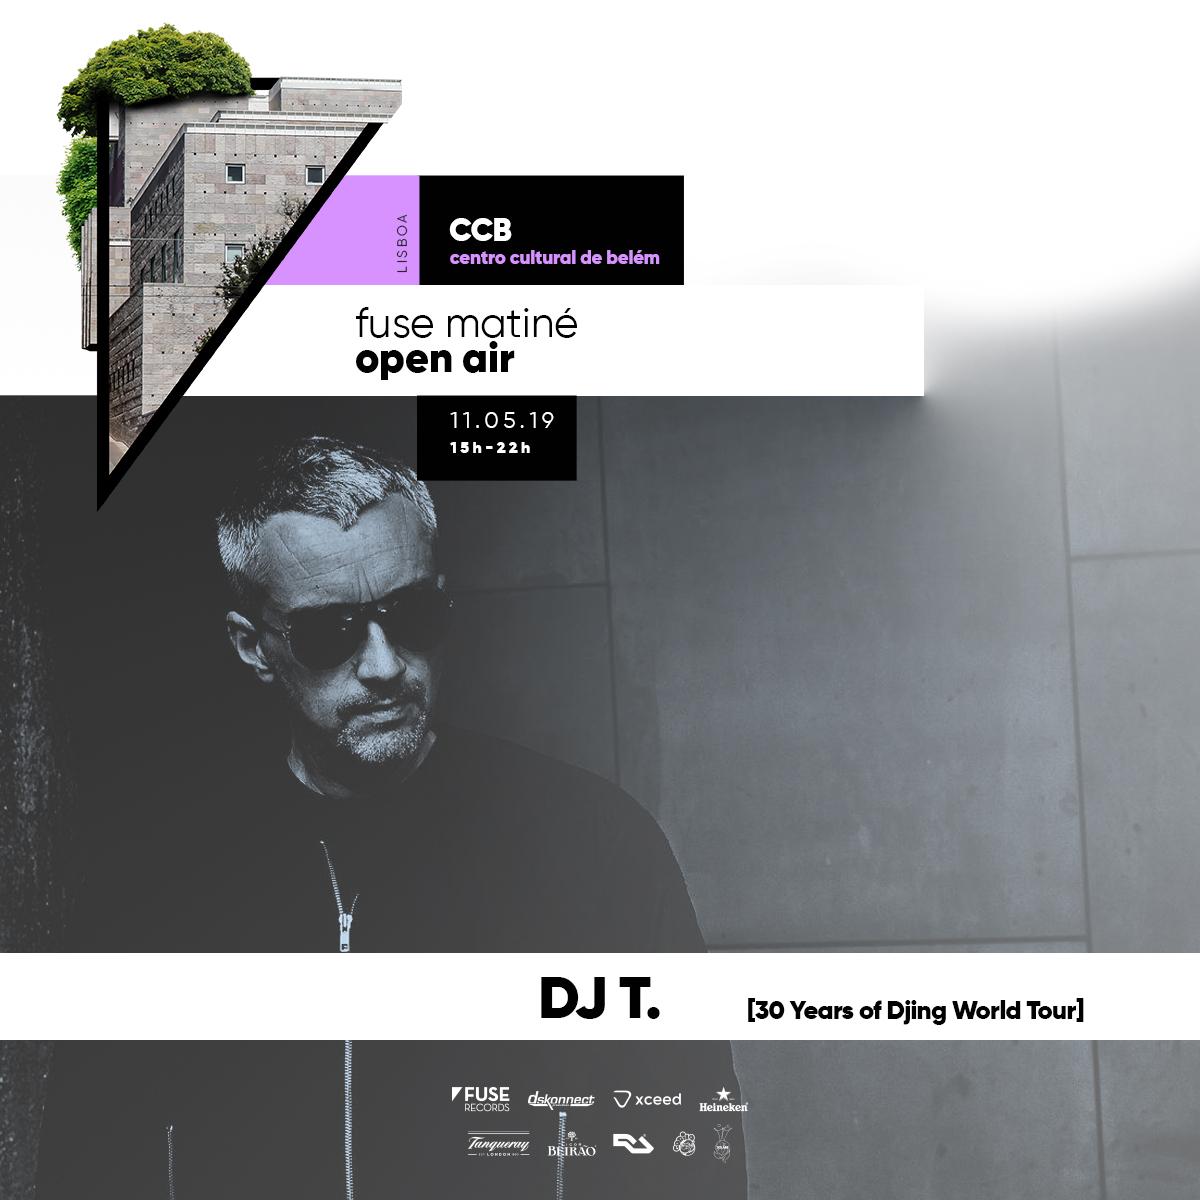 FuseMatine_110519_Profile_DJT.jpg